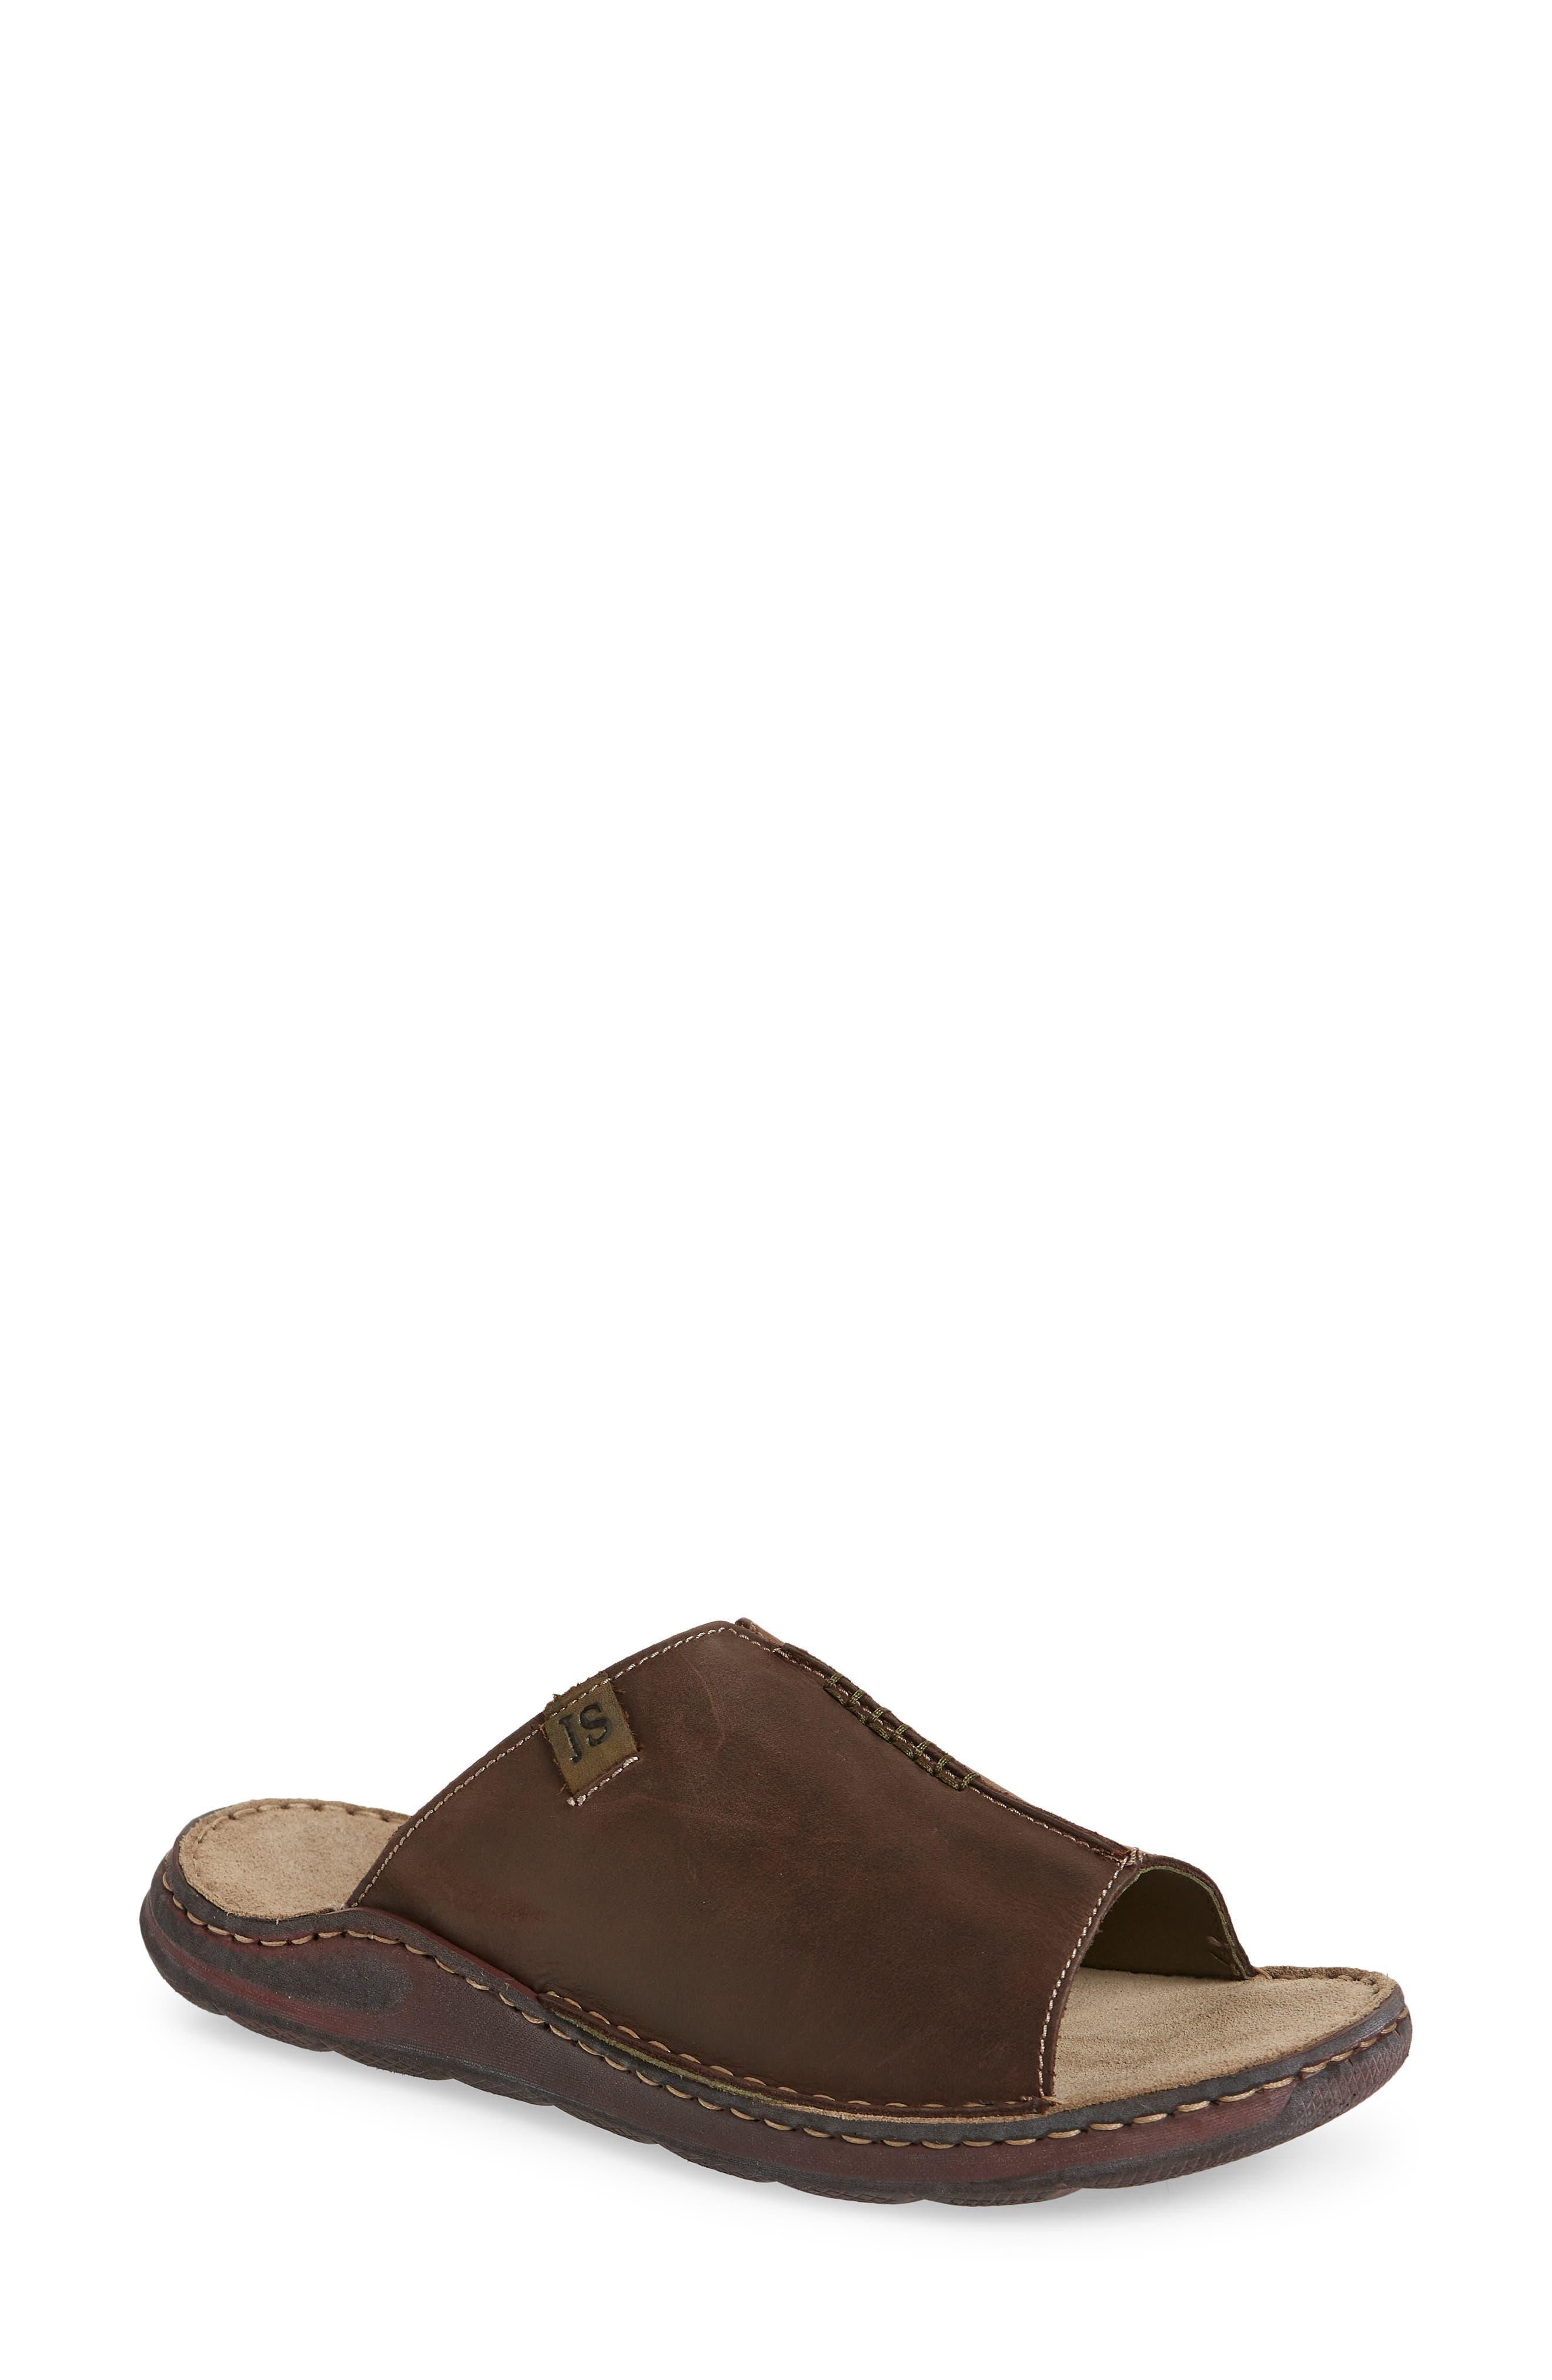 Maverick 03 Slide Sandal